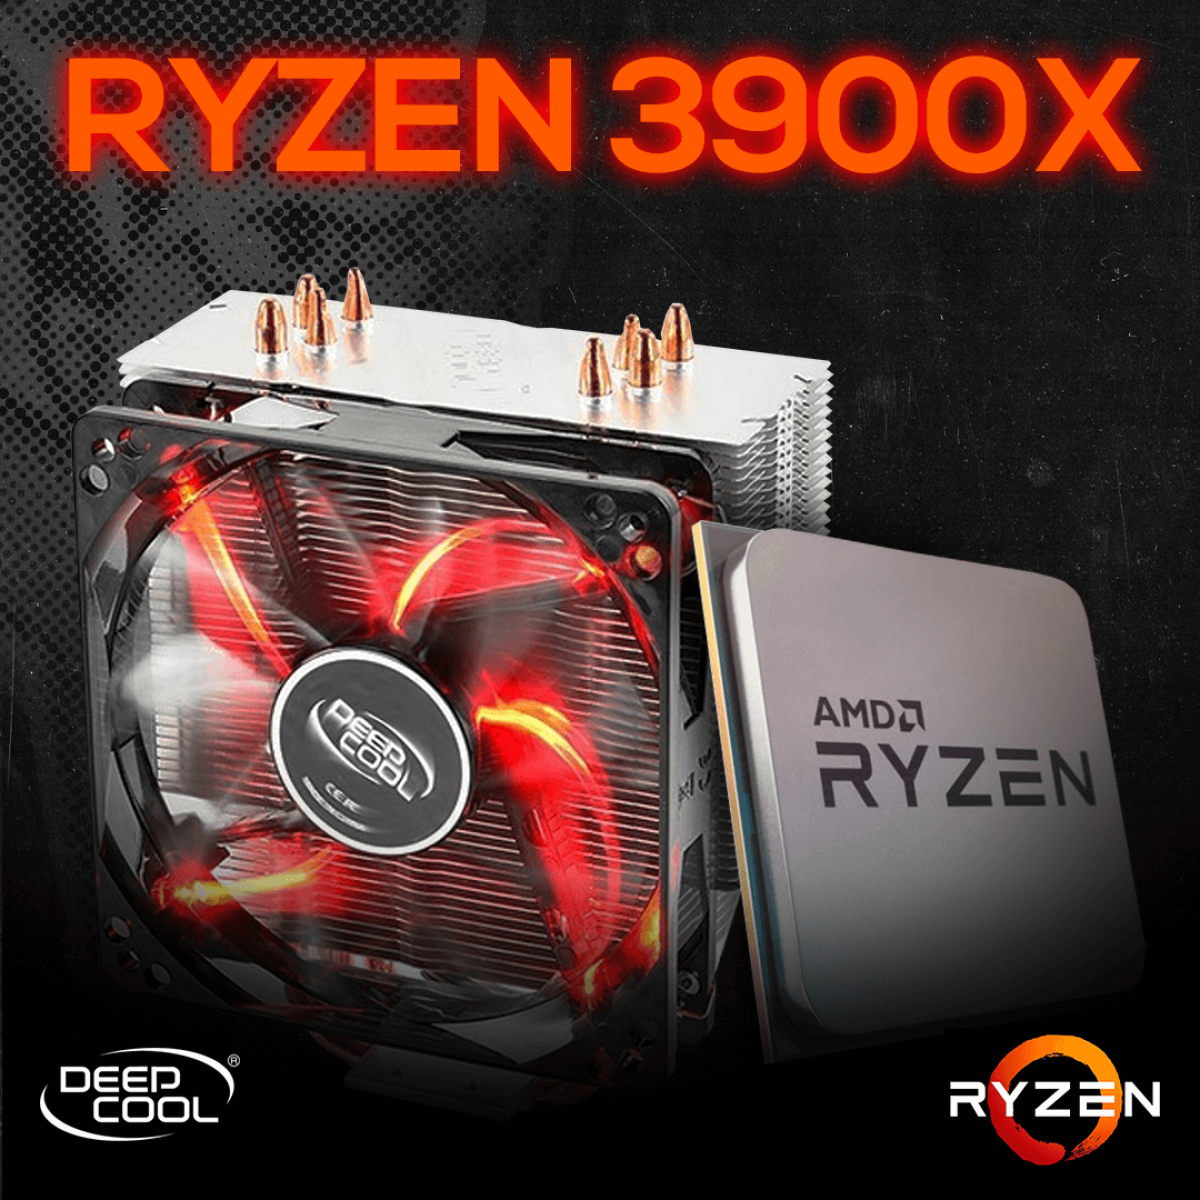 Kit Processador AMD Ryzen 9 3900x 3.8ghz (4.6ghz Turbo), 12-cores 24-threads, + DeepCool Gammaxx 400